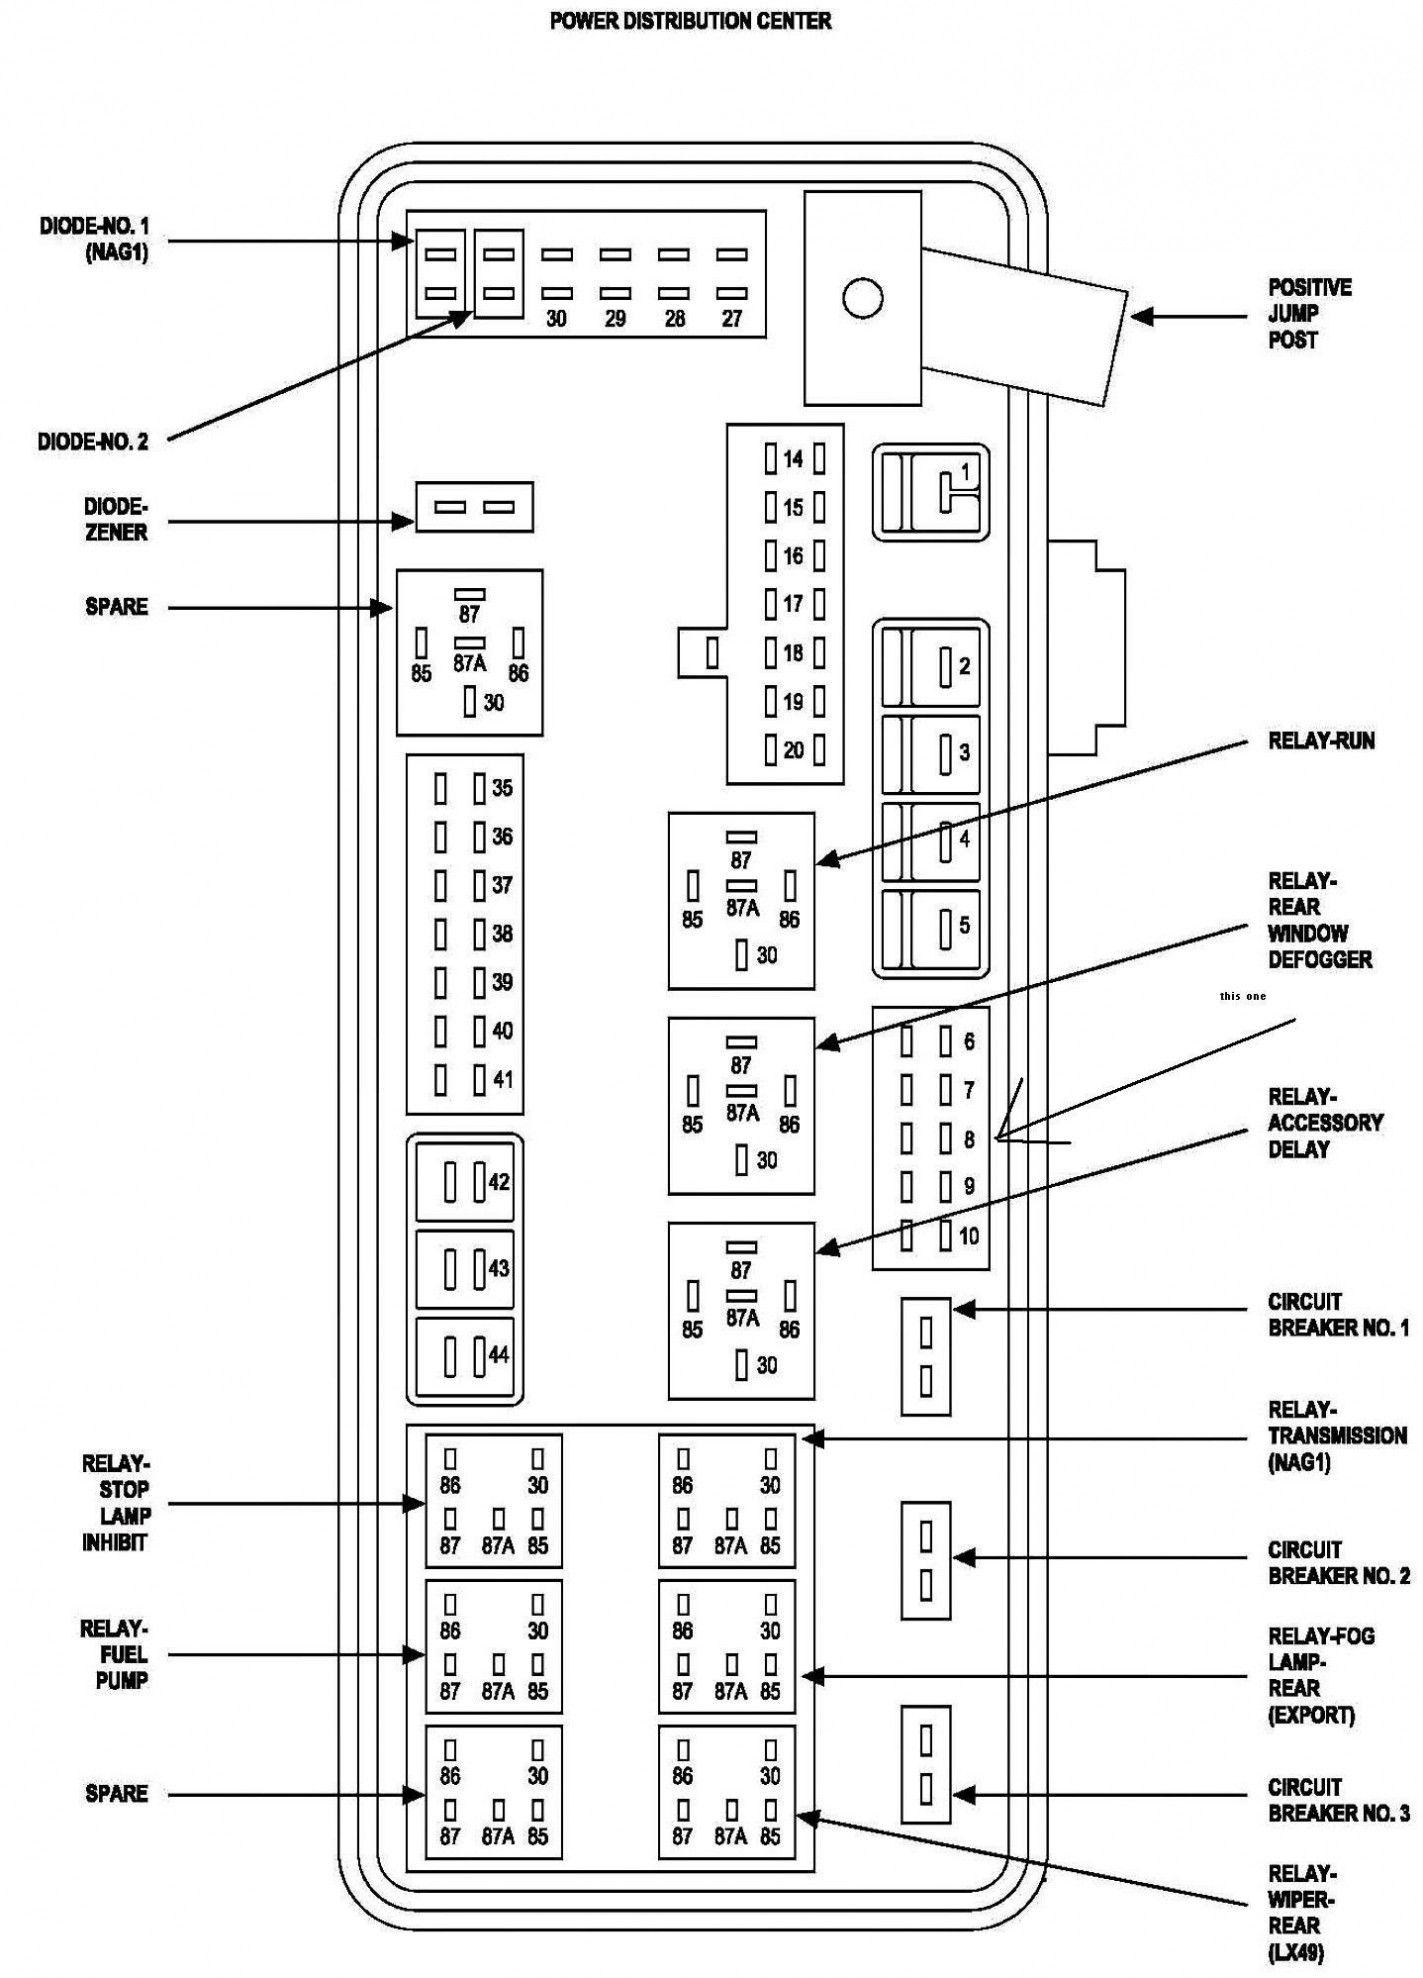 new 2004 dodge ram 1500 infinity wiring diagram diagram diagramsample diagramtemplate wiringdiagram [ 1423 x 1978 Pixel ]